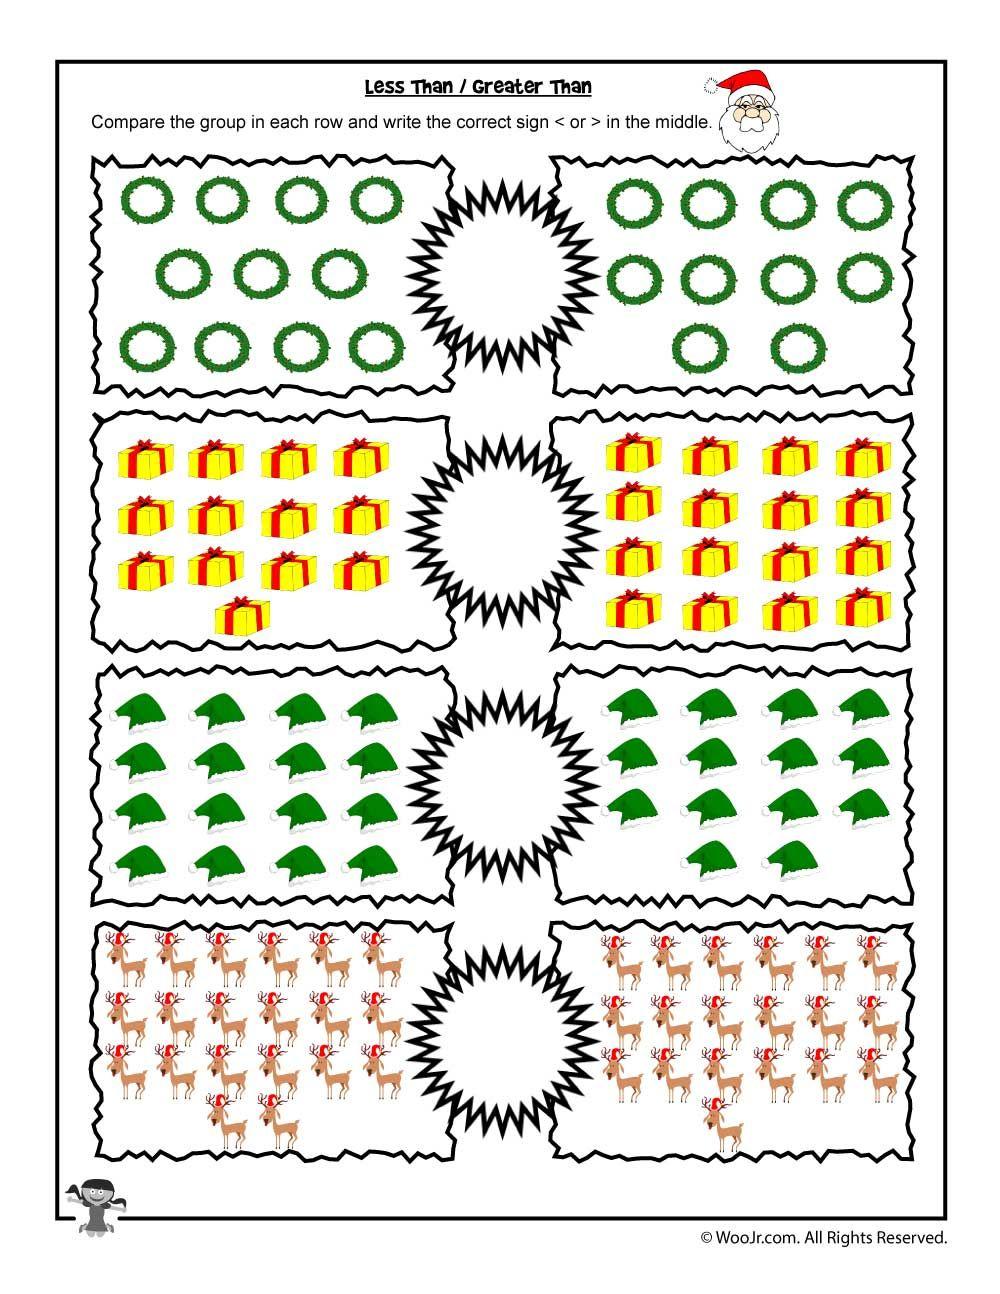 Easy 1 - 20 Greater Than, Less Than Worksheet | Christmas math ...